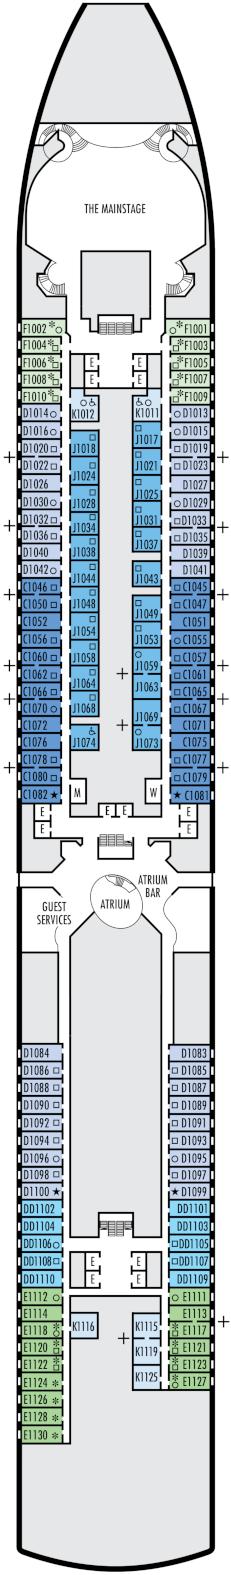 Nieuw Amsterdam Main Deck Deck Plan